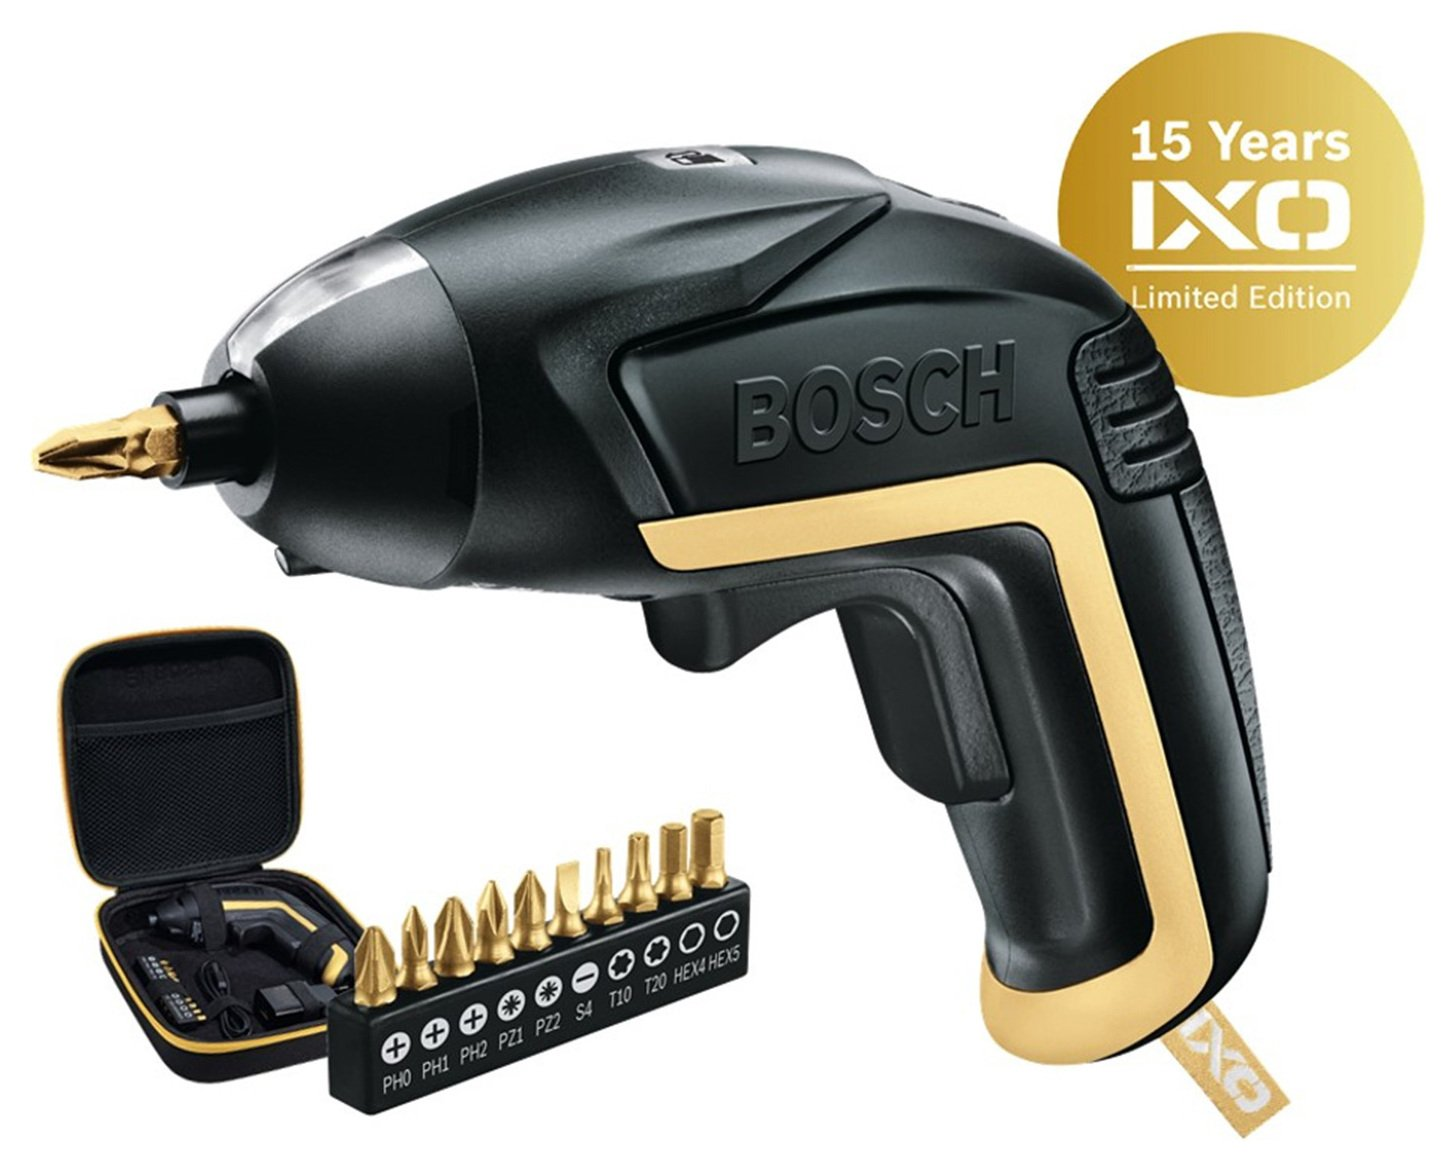 Bosch Special Edition IXO Cordless Screwdriver